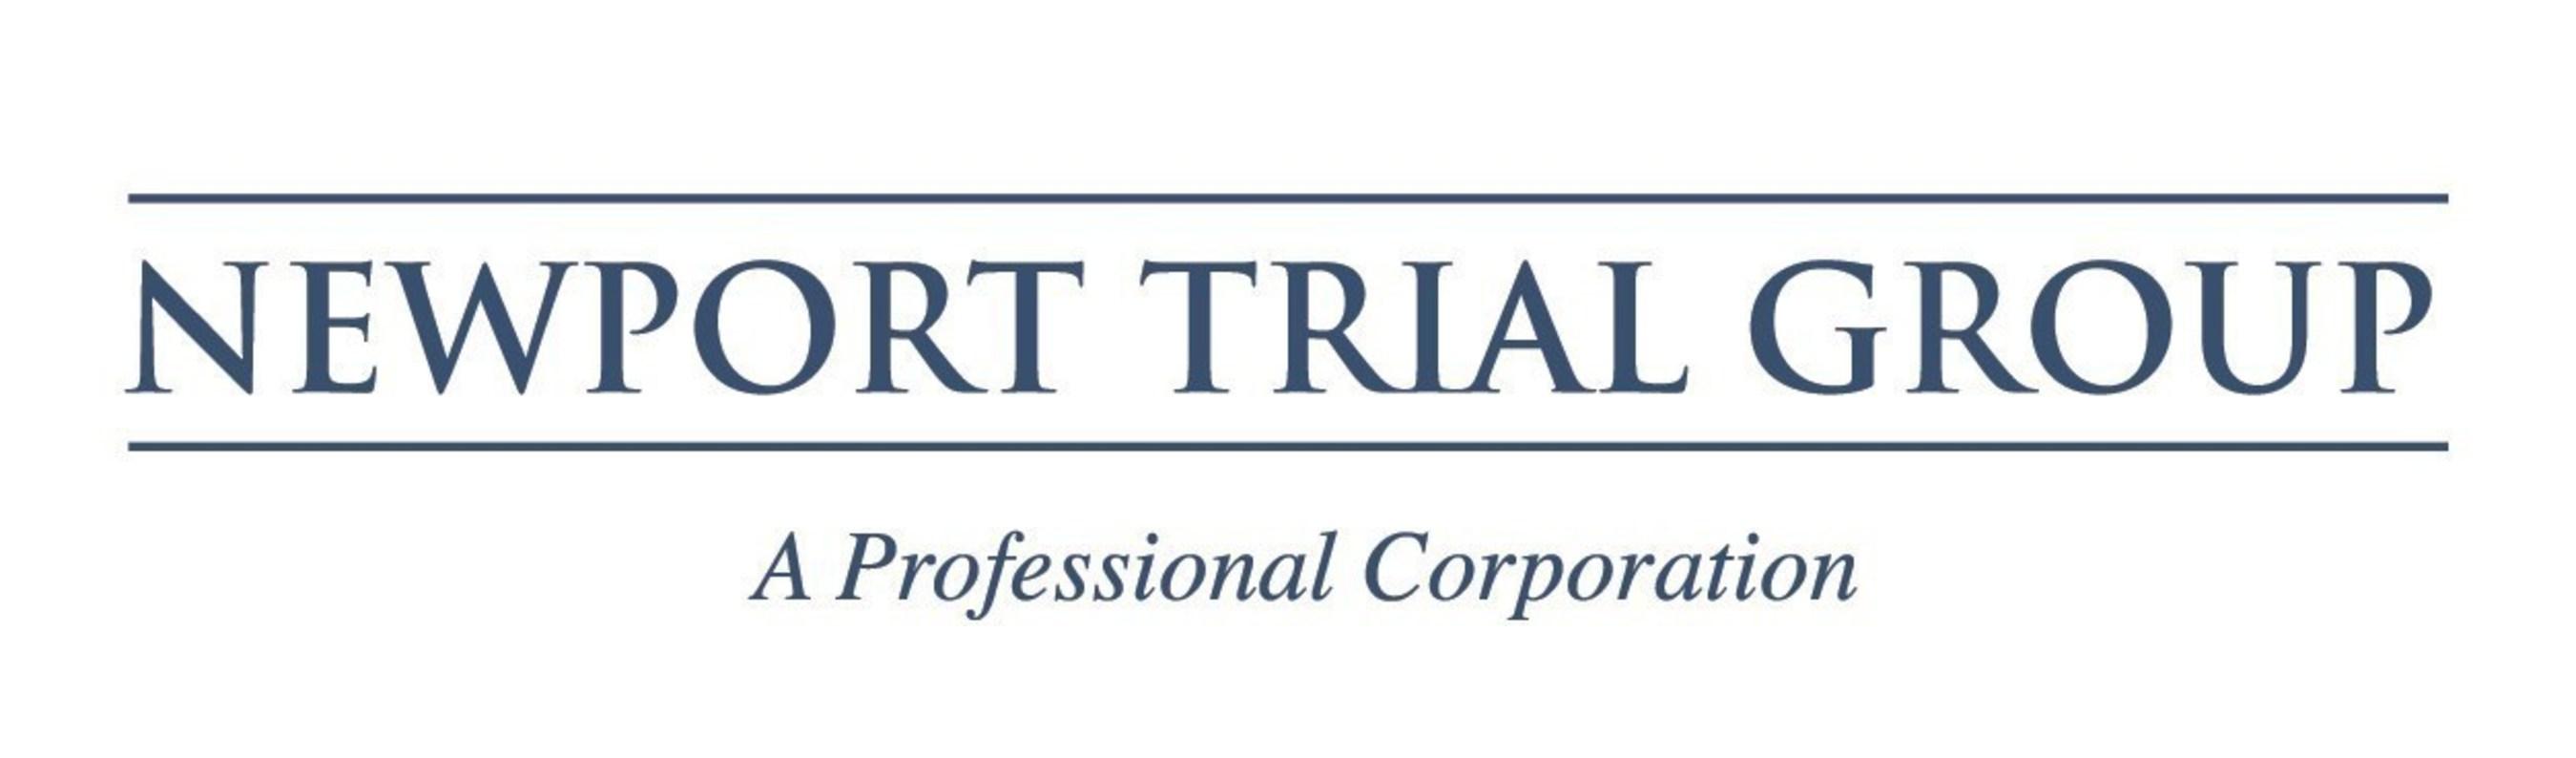 Newport Trial Group logo